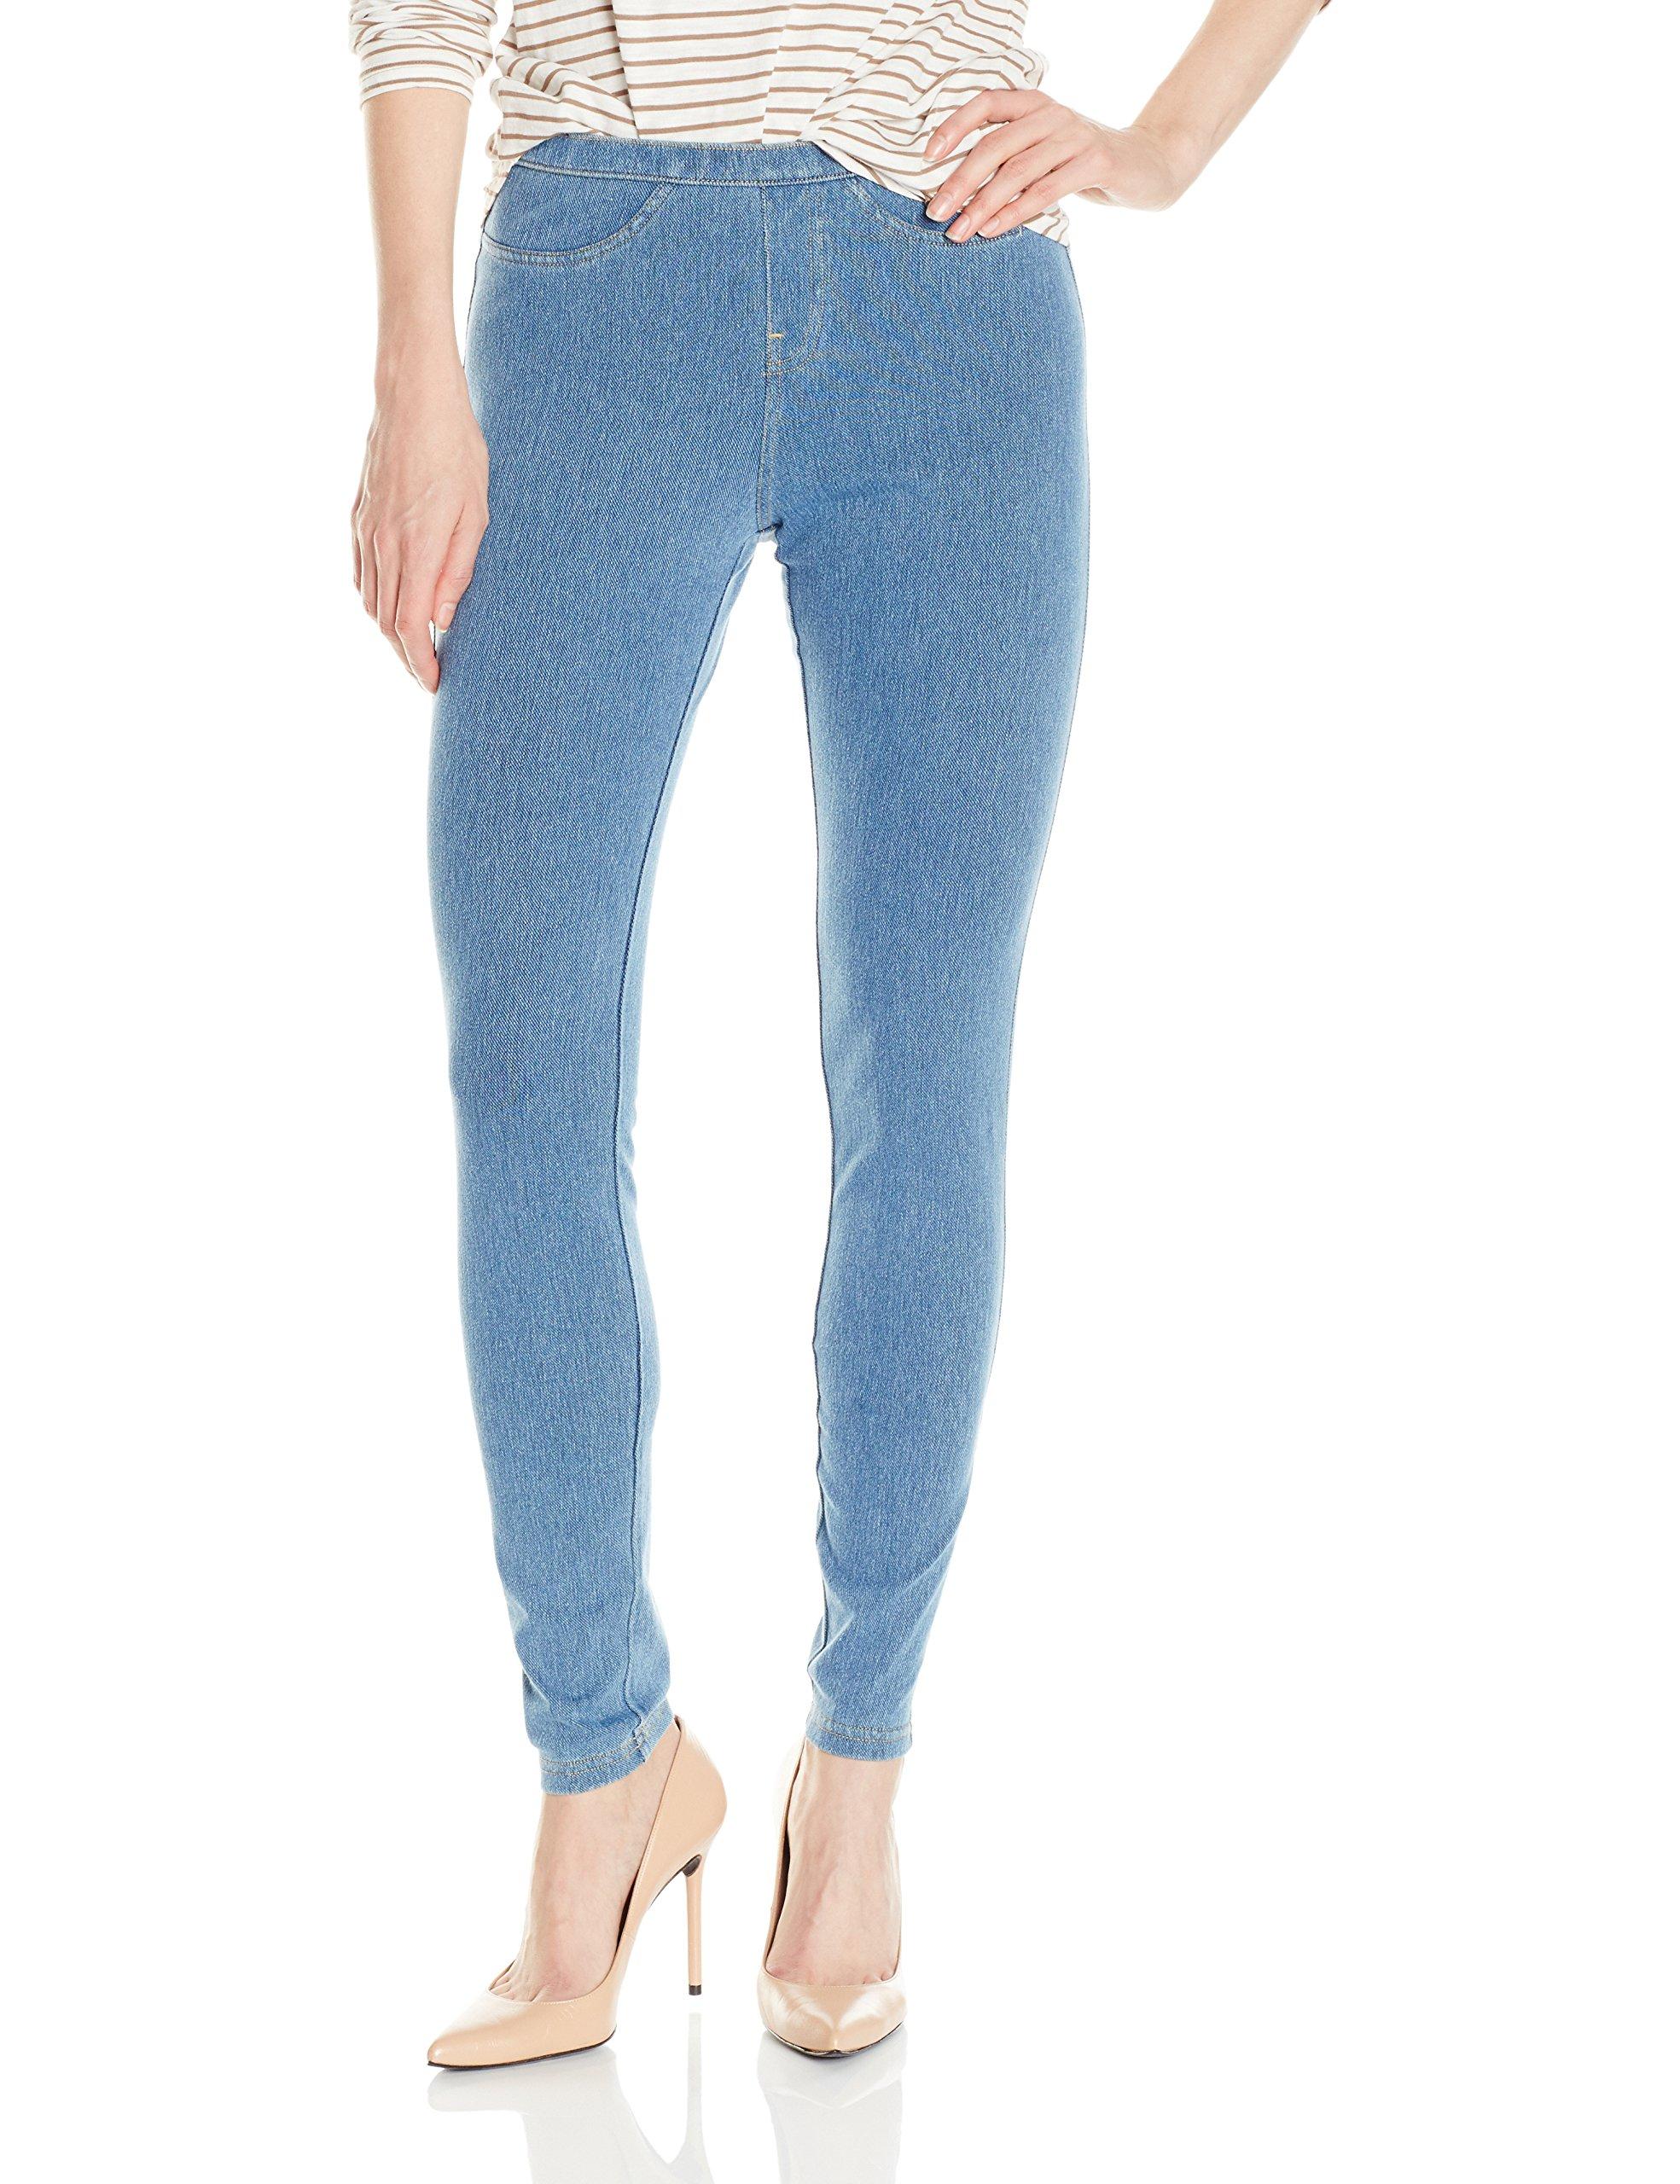 No Nonsense Women's Classic Denim Legging, Light Denim, M